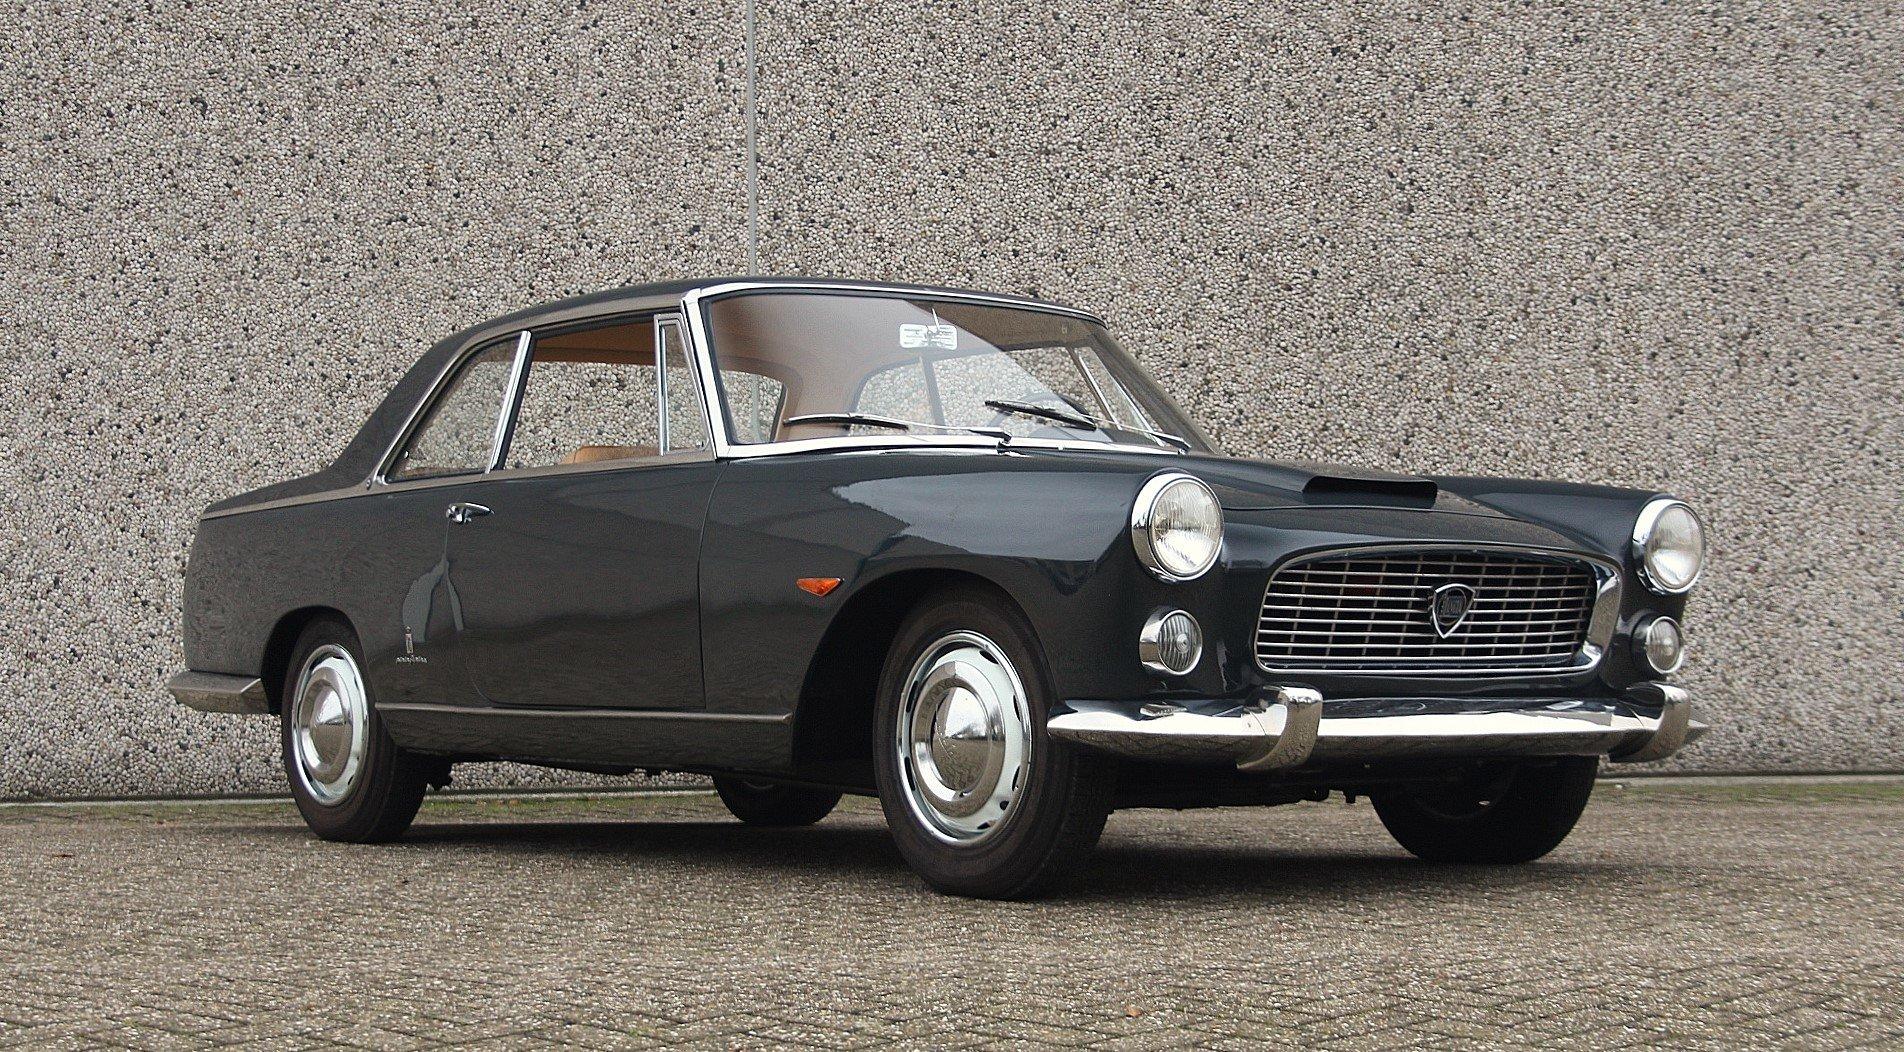 1963 Lancia Flaminia Pininfarina Coupe 2.5 For Sale (picture 1 of 6)